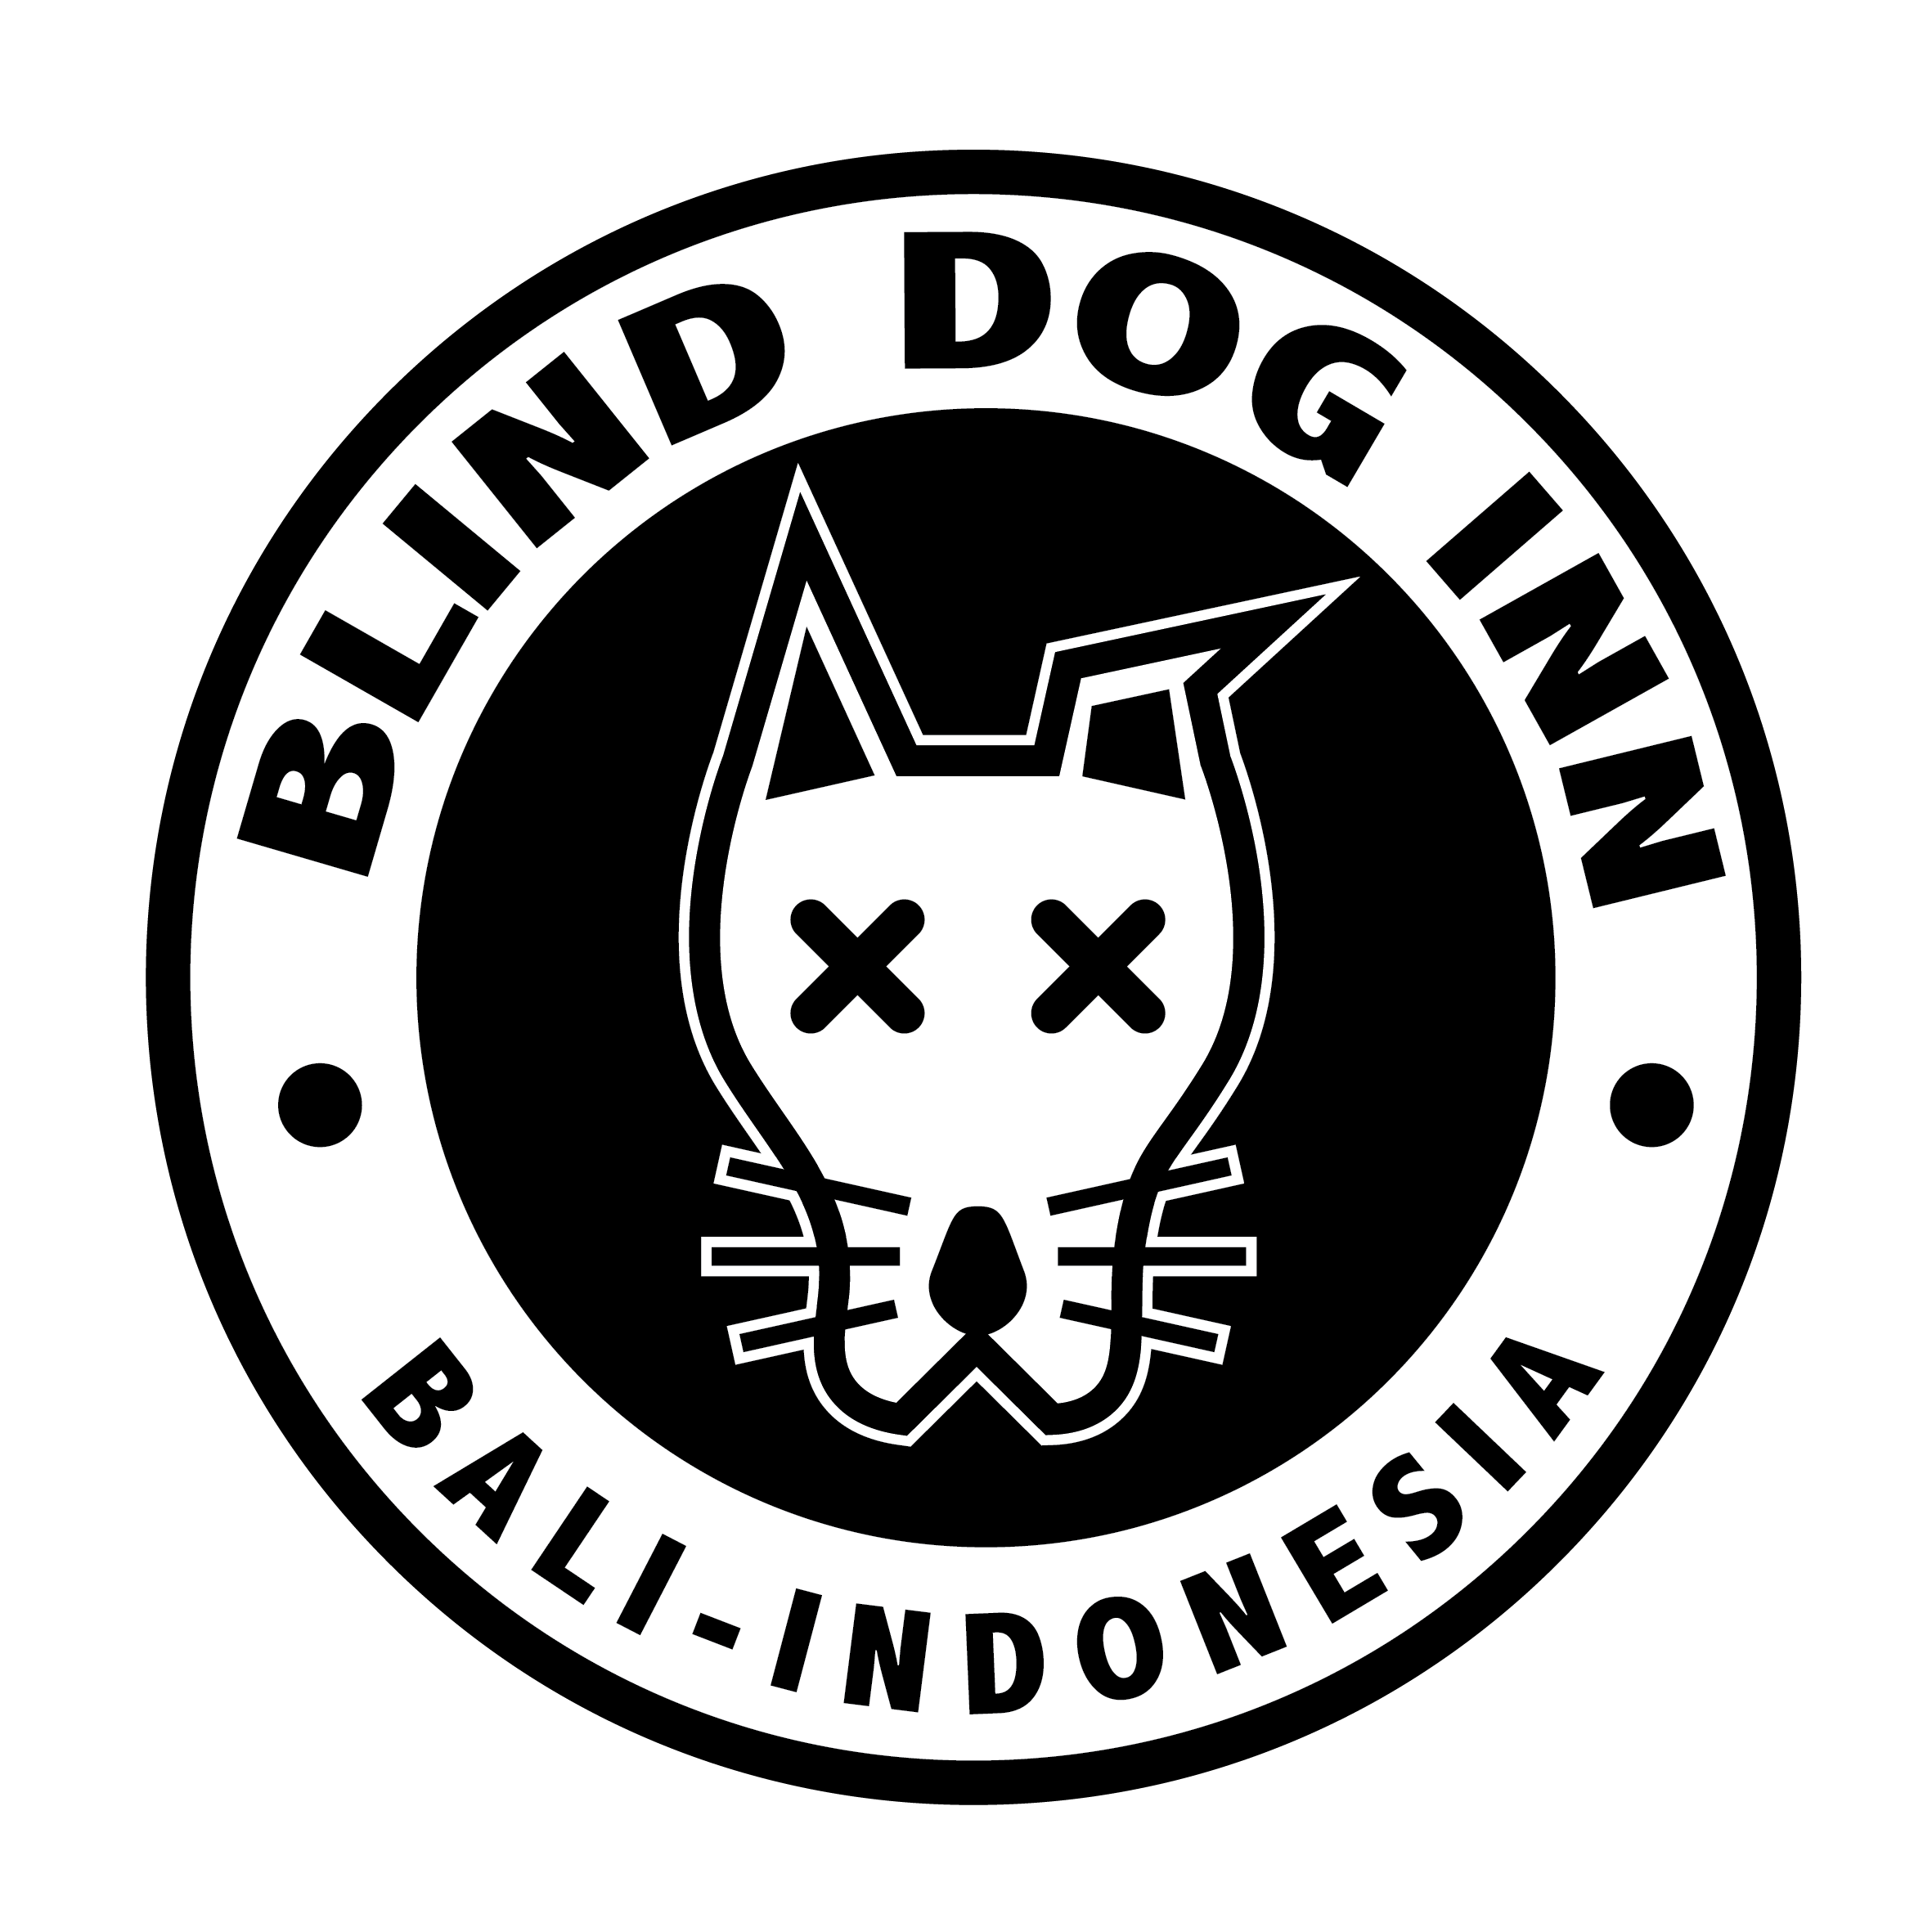 4 Nights Kite Surf Camp | Blind Dog Inn - Surf Camp for All Levels!